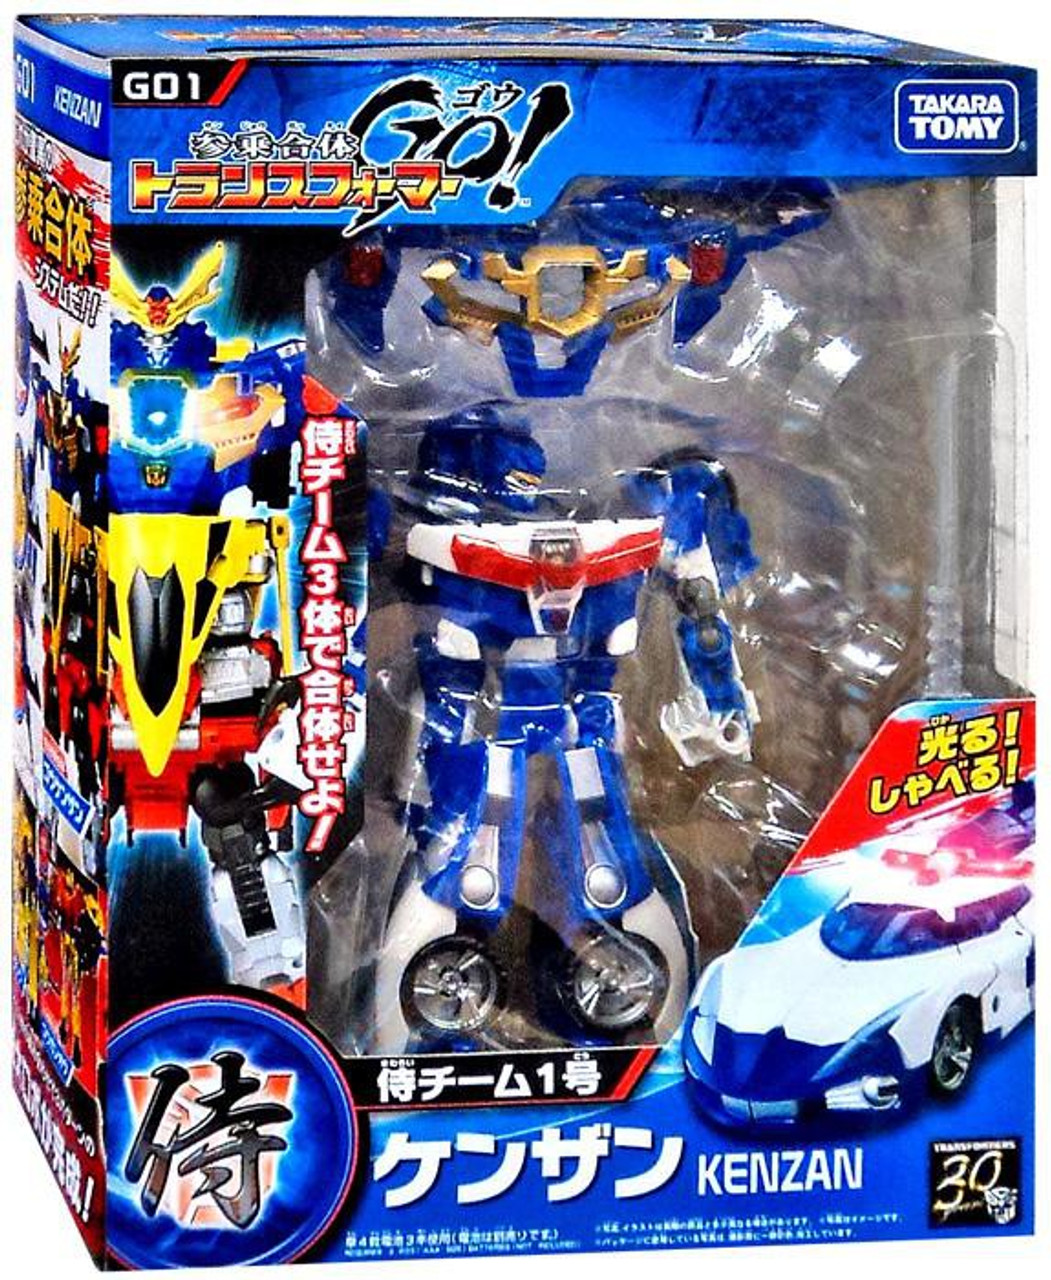 G01 KENZAN Japan Takara Tomy Transformers Go